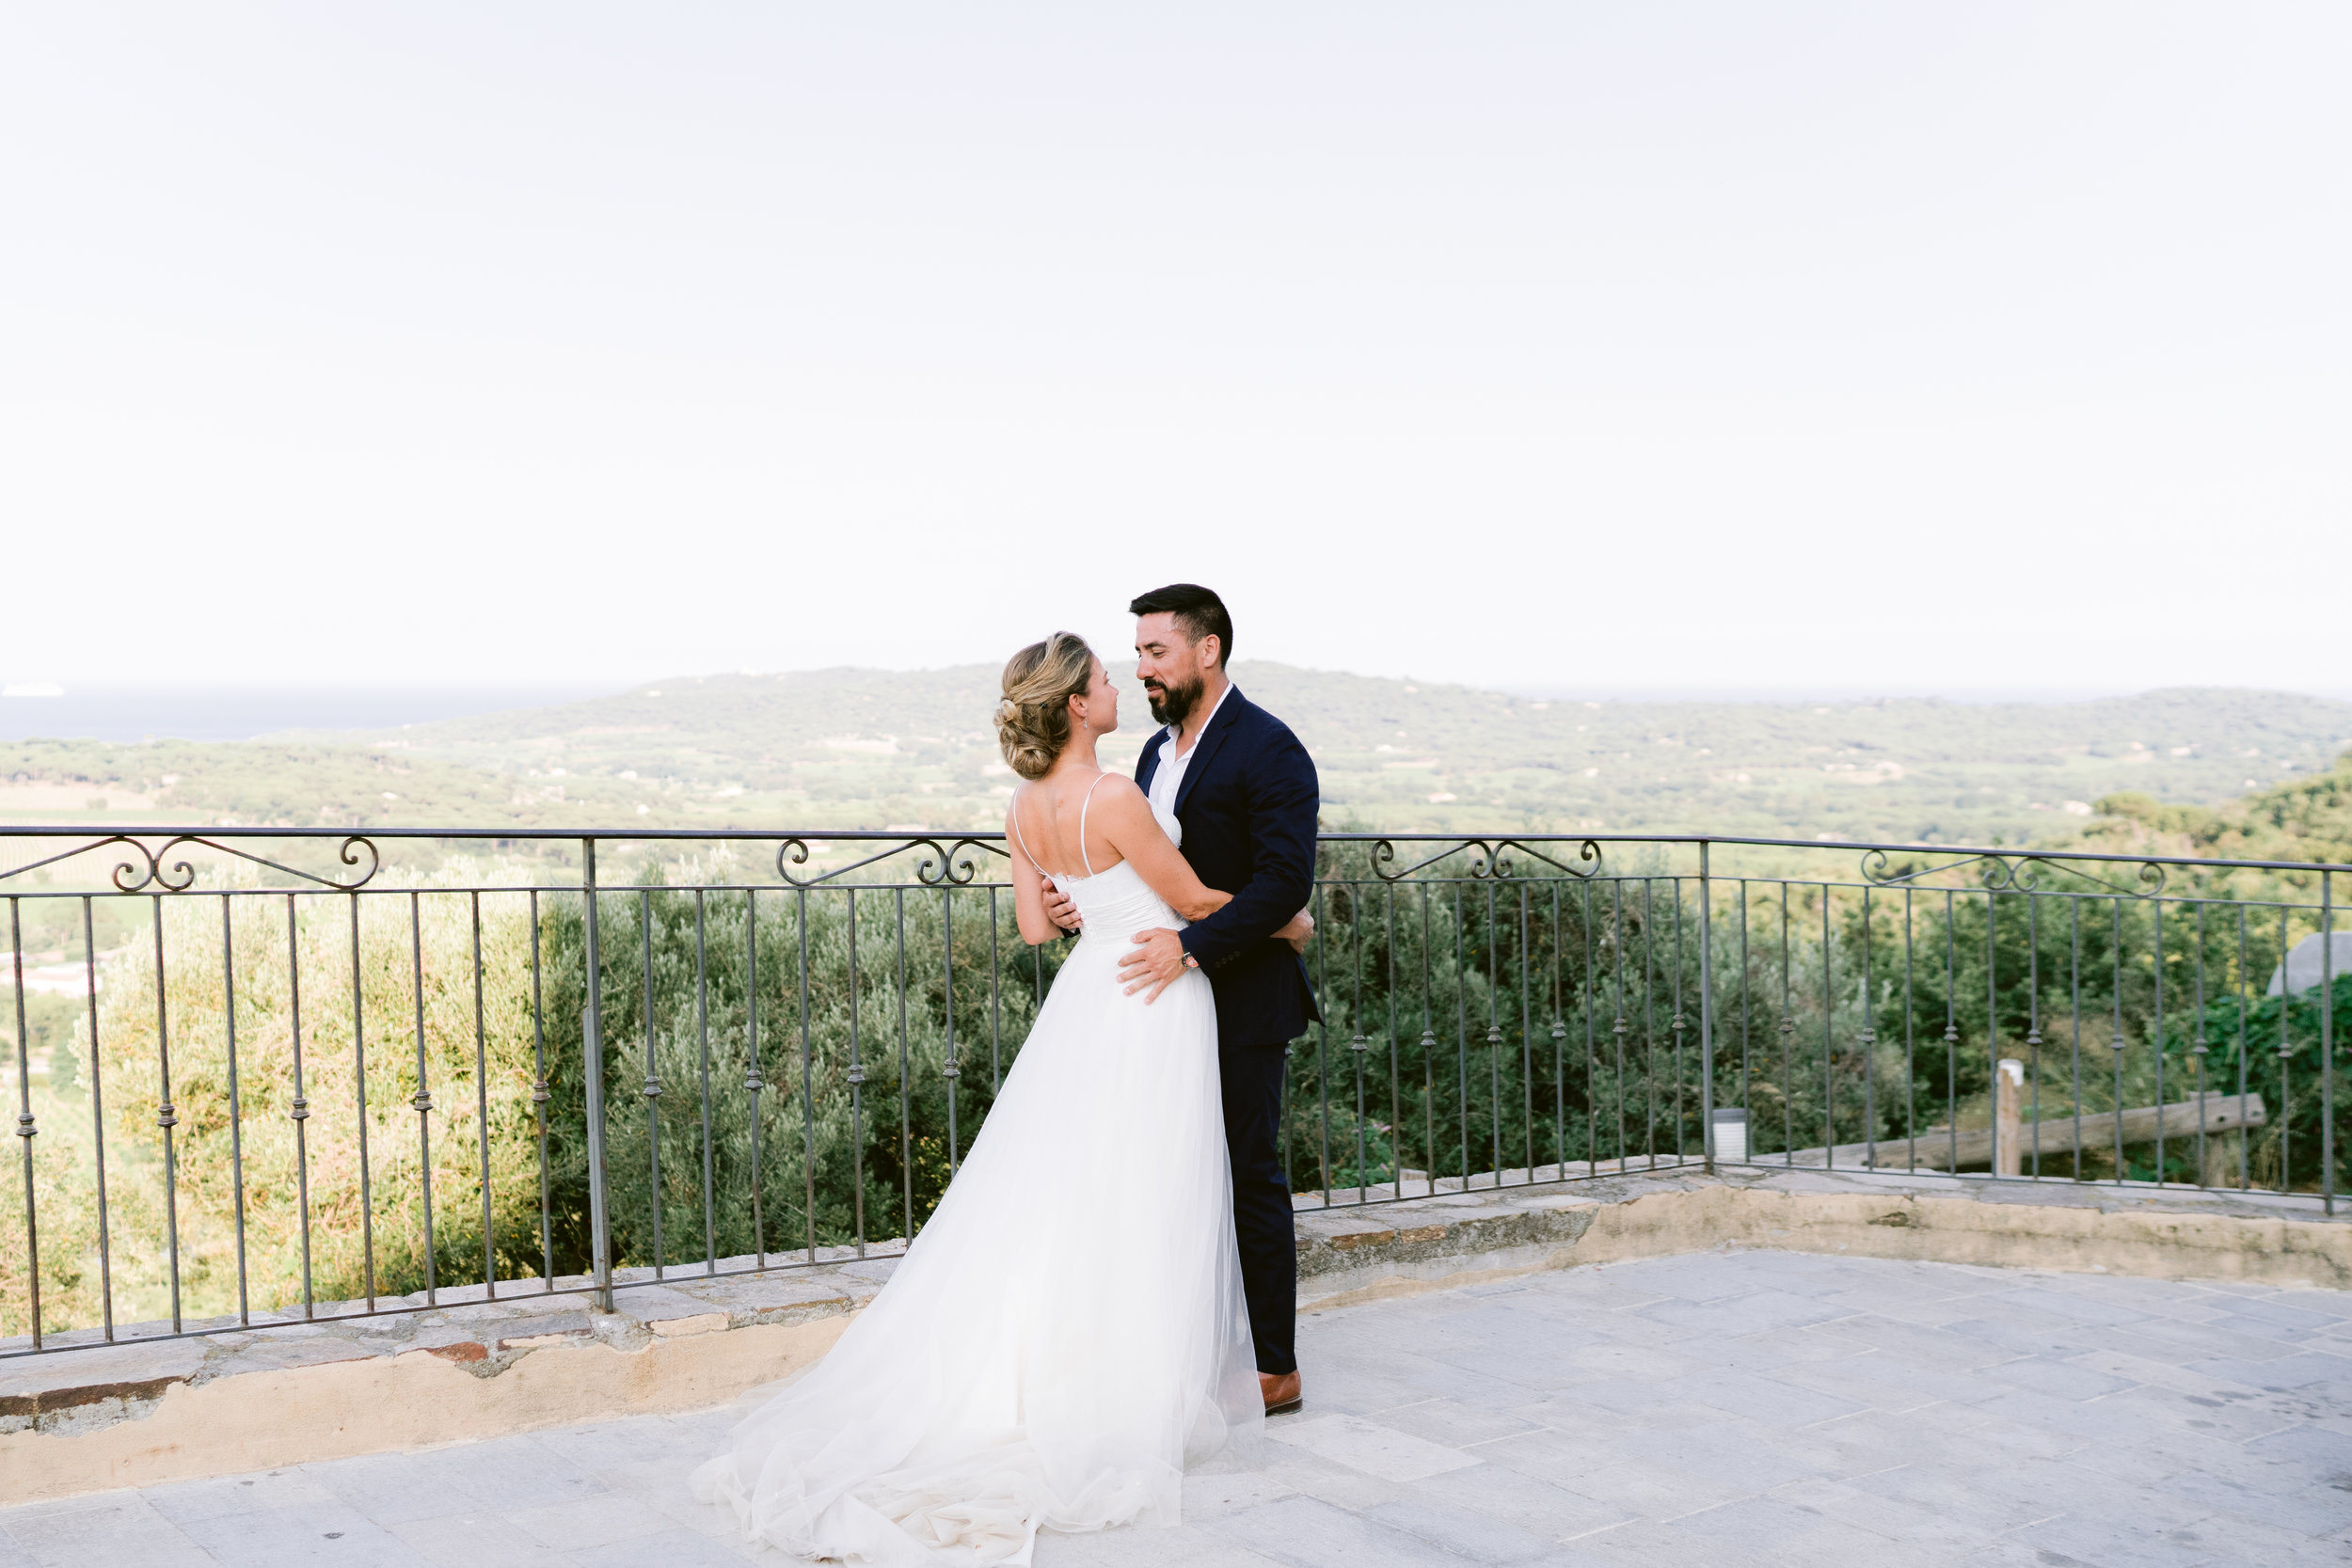 english photographer in france, wedding photographer saint tropez, romantic wedding photography france, chateau wedding france, cote d'azur wedding photographer, ramatuelle wedding (2).jpg